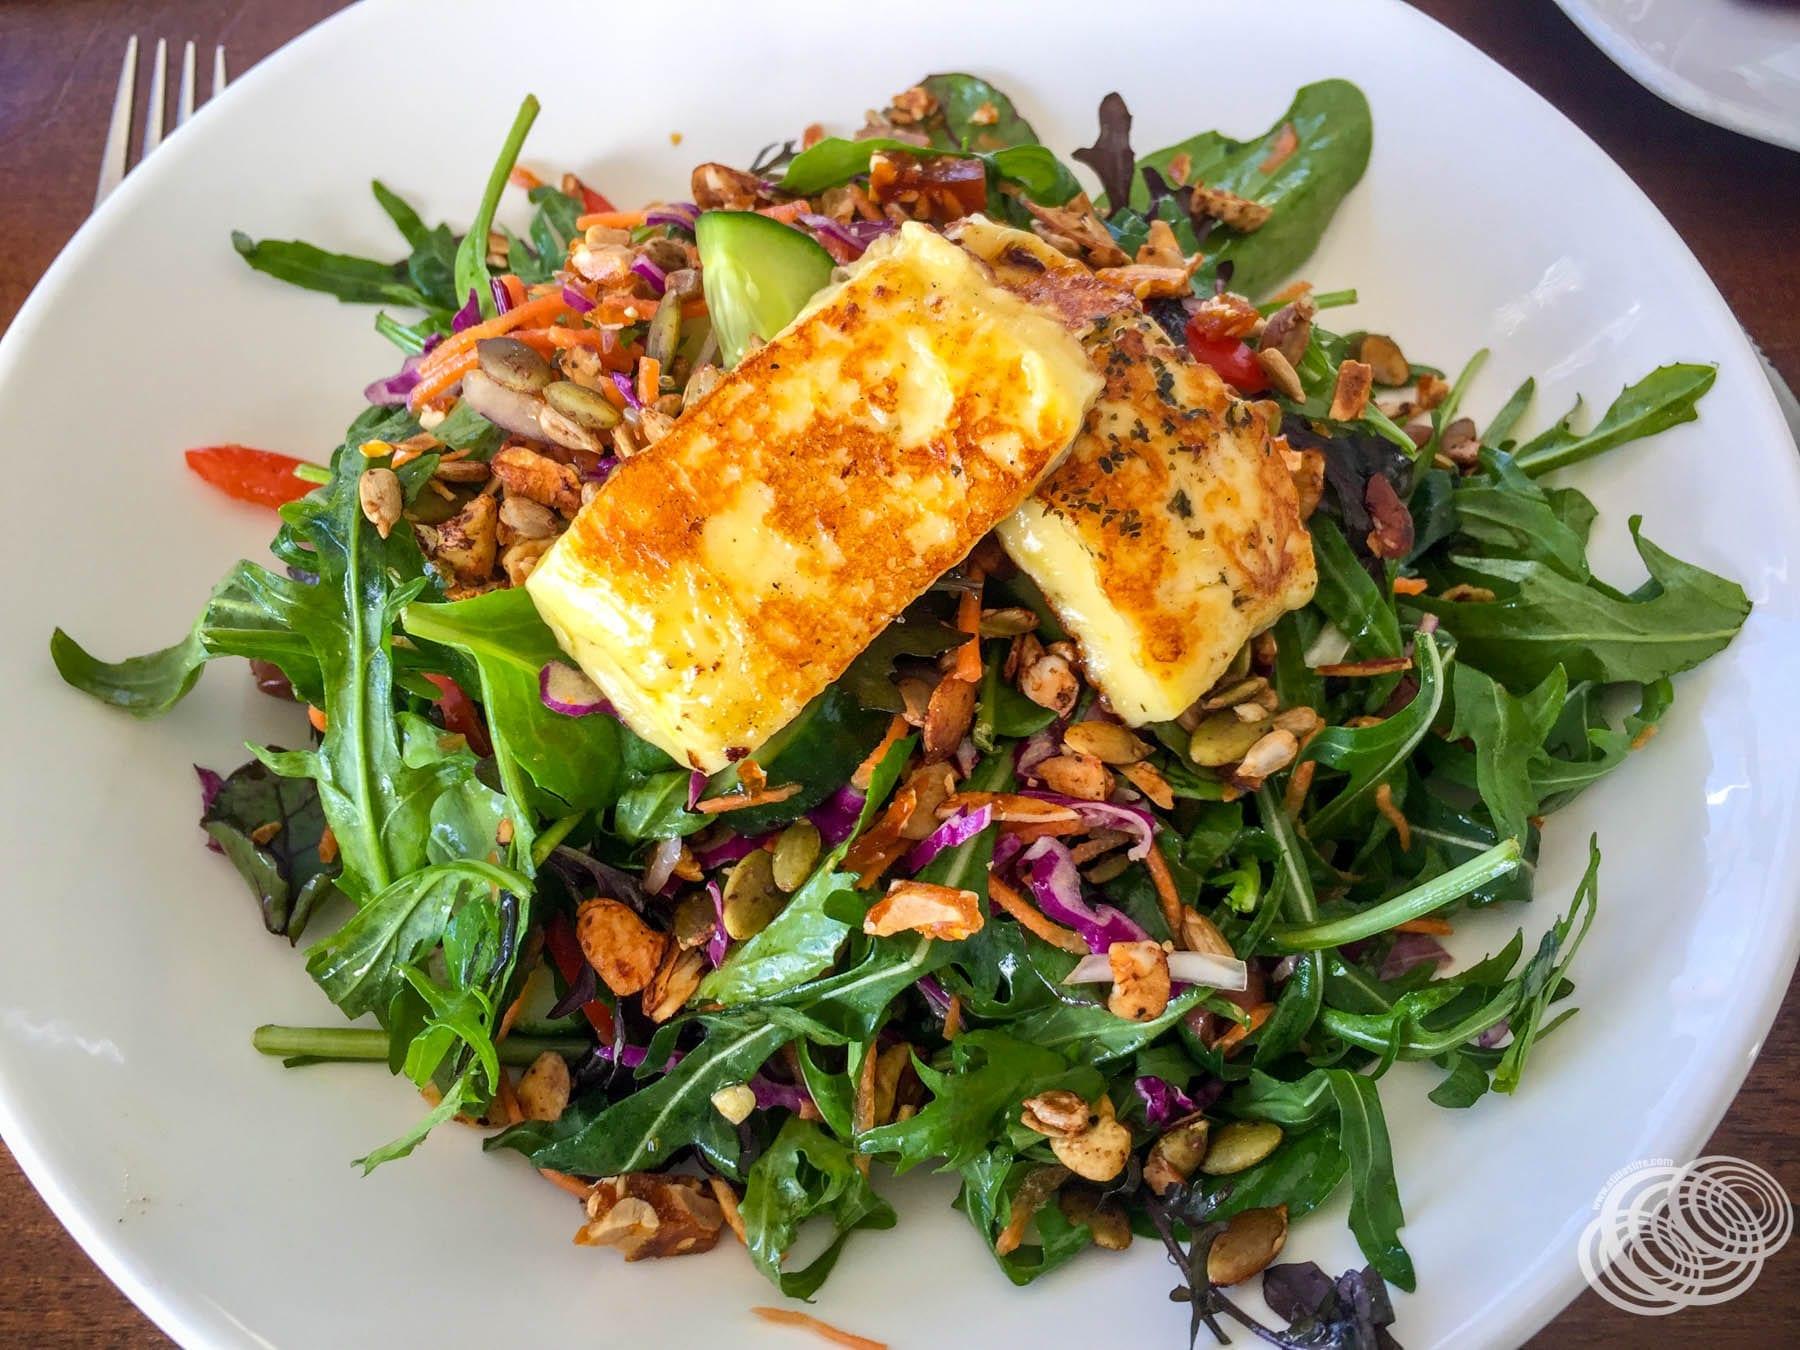 Salad at Entice Cafe Masterton